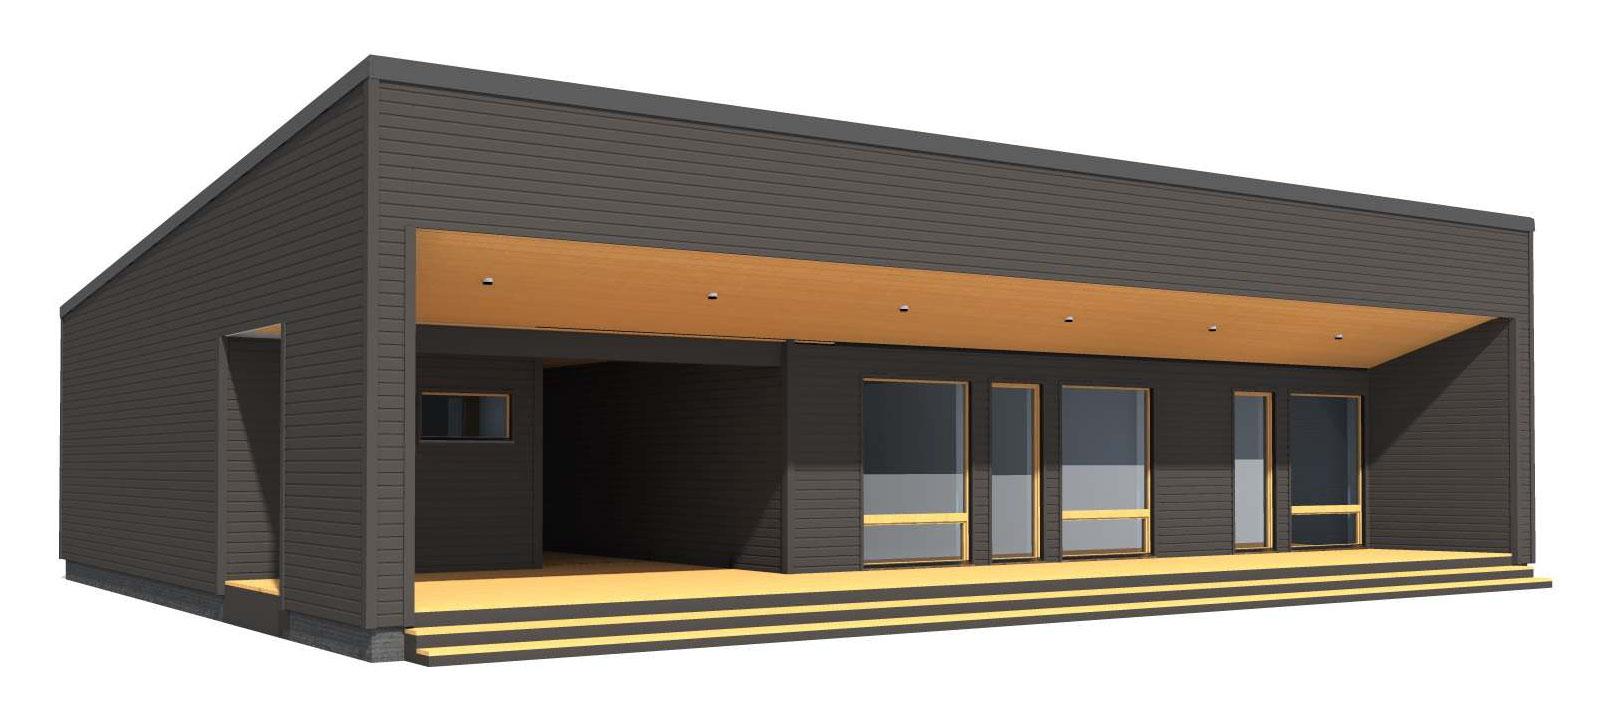 Woodville Design Houtbouw Woning Woodgate